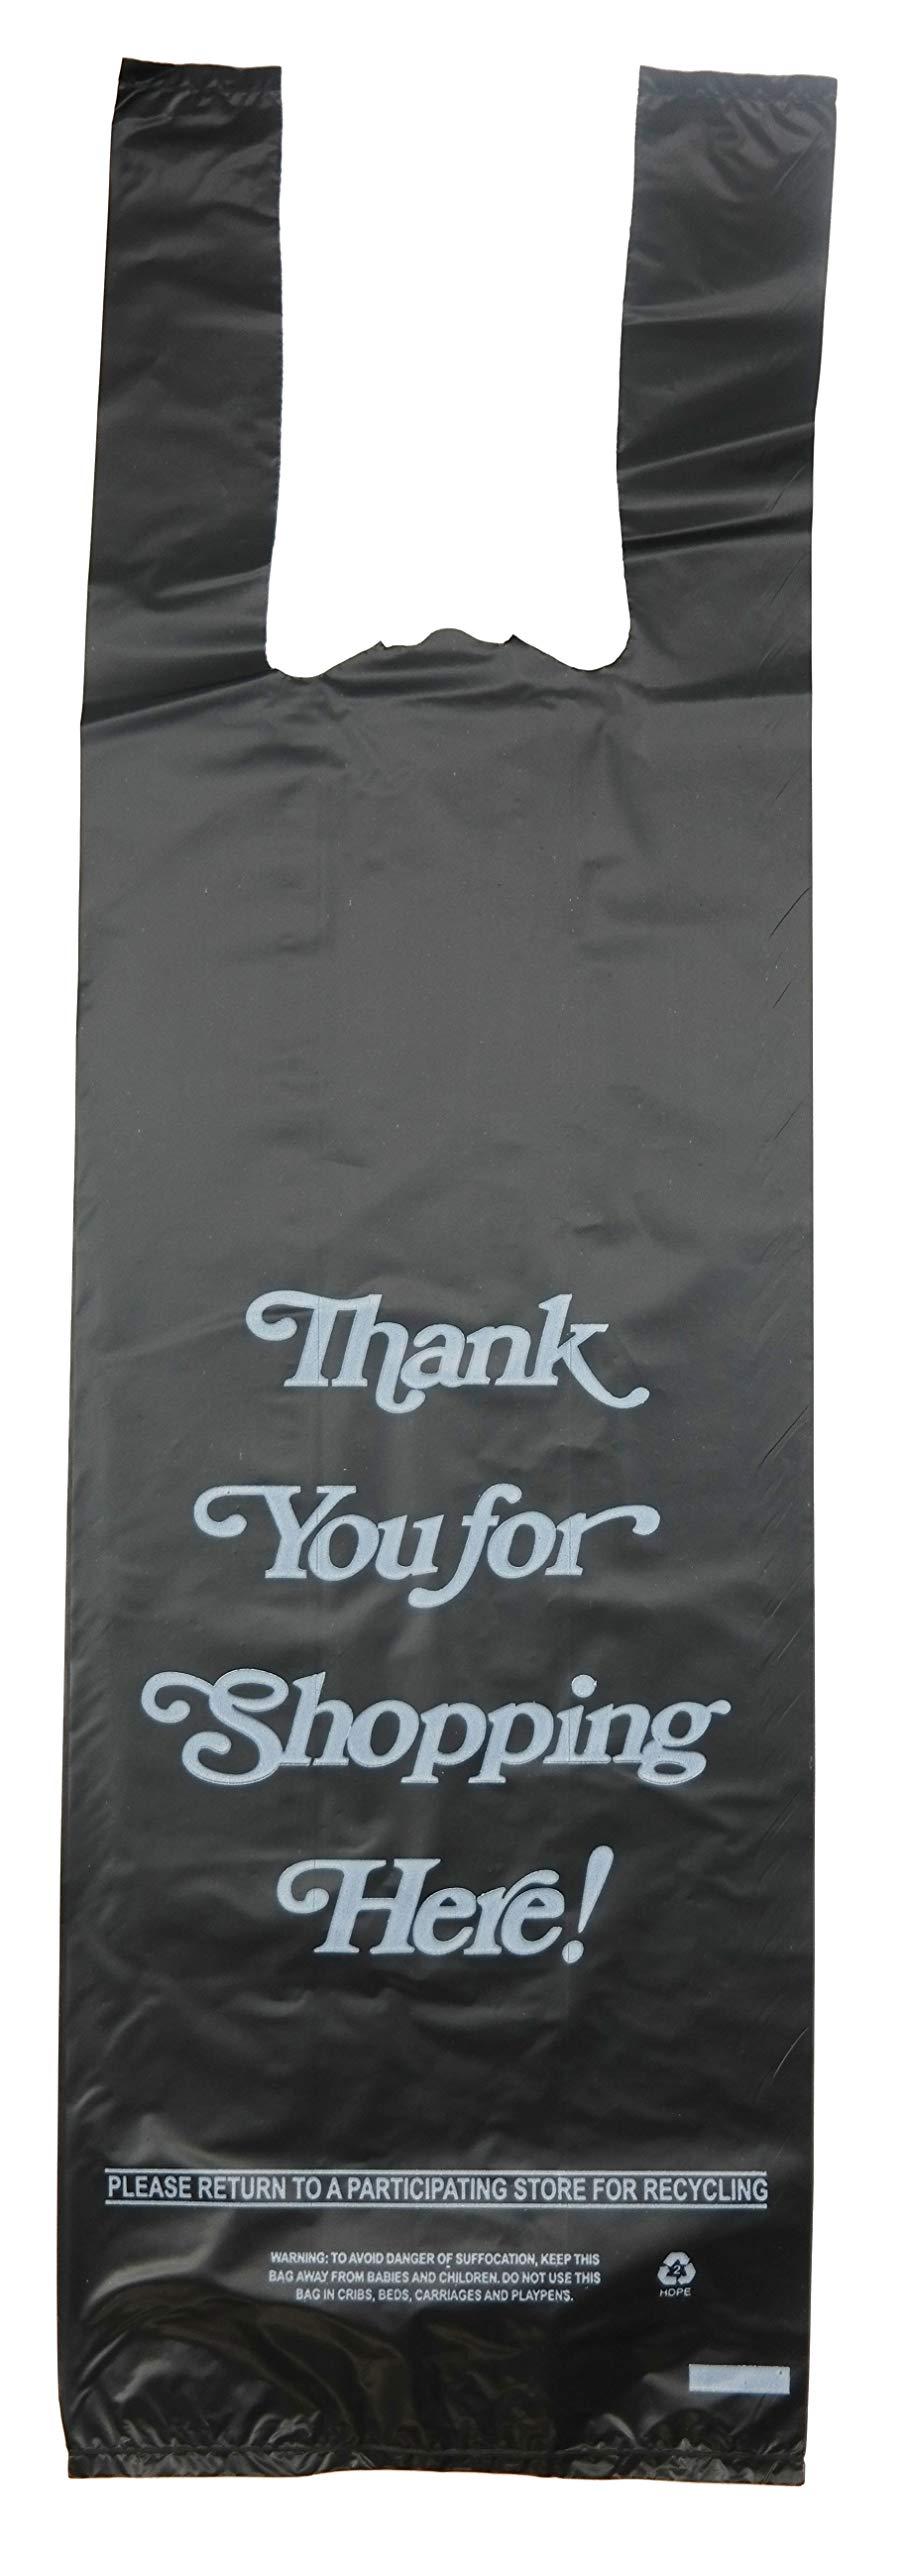 Plastic Bag- 'Thank You' White Print 1 bottle Liquor Black T Shirt Bag 6''x 4''x 20'' 25 mic - 1000 bags/case